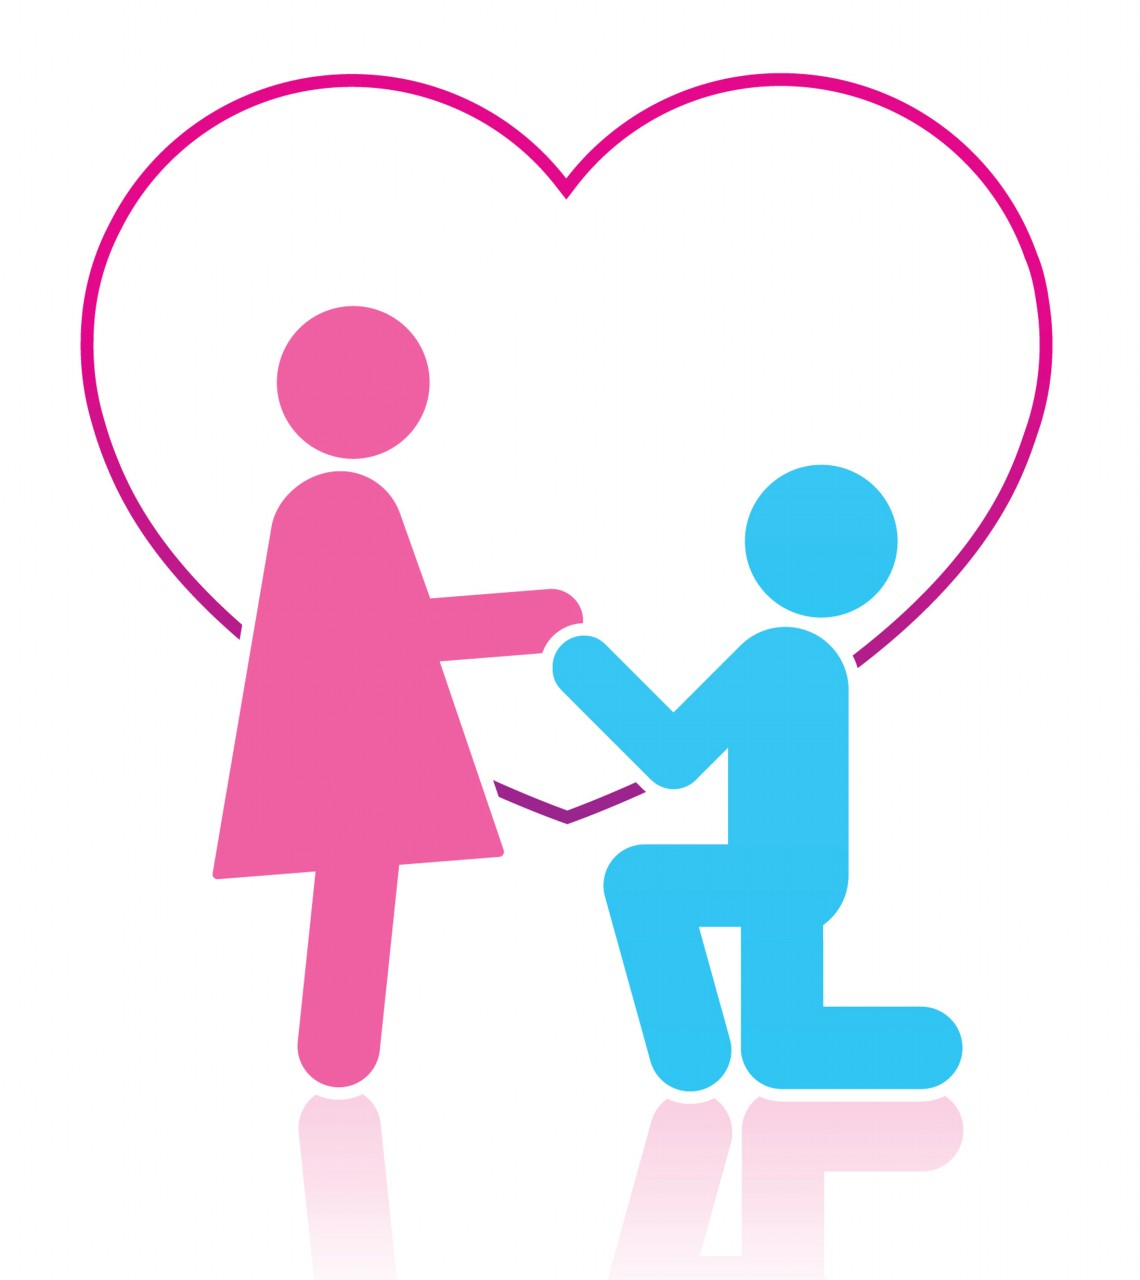 Clip Art For Love Clipart Clipartwiz 2-Clip art for love clipart clipartwiz 2-2